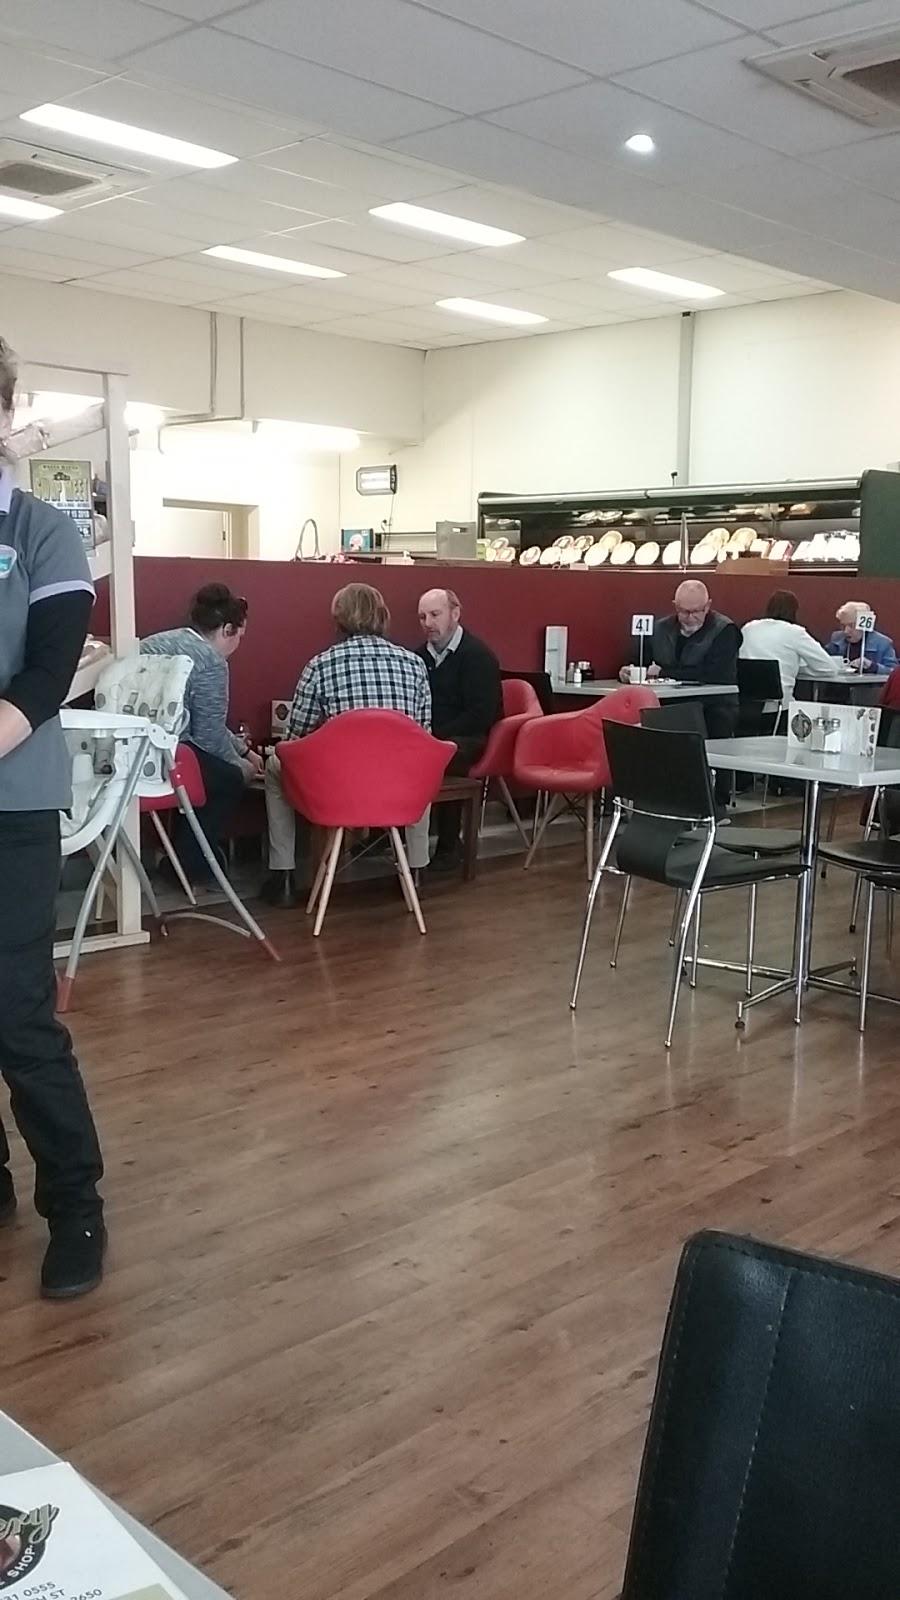 South Wagga Bakery | cafe | 8/180 Forsyth St, Wagga Wagga NSW 2650, Australia | 0269310555 OR +61 2 6931 0555